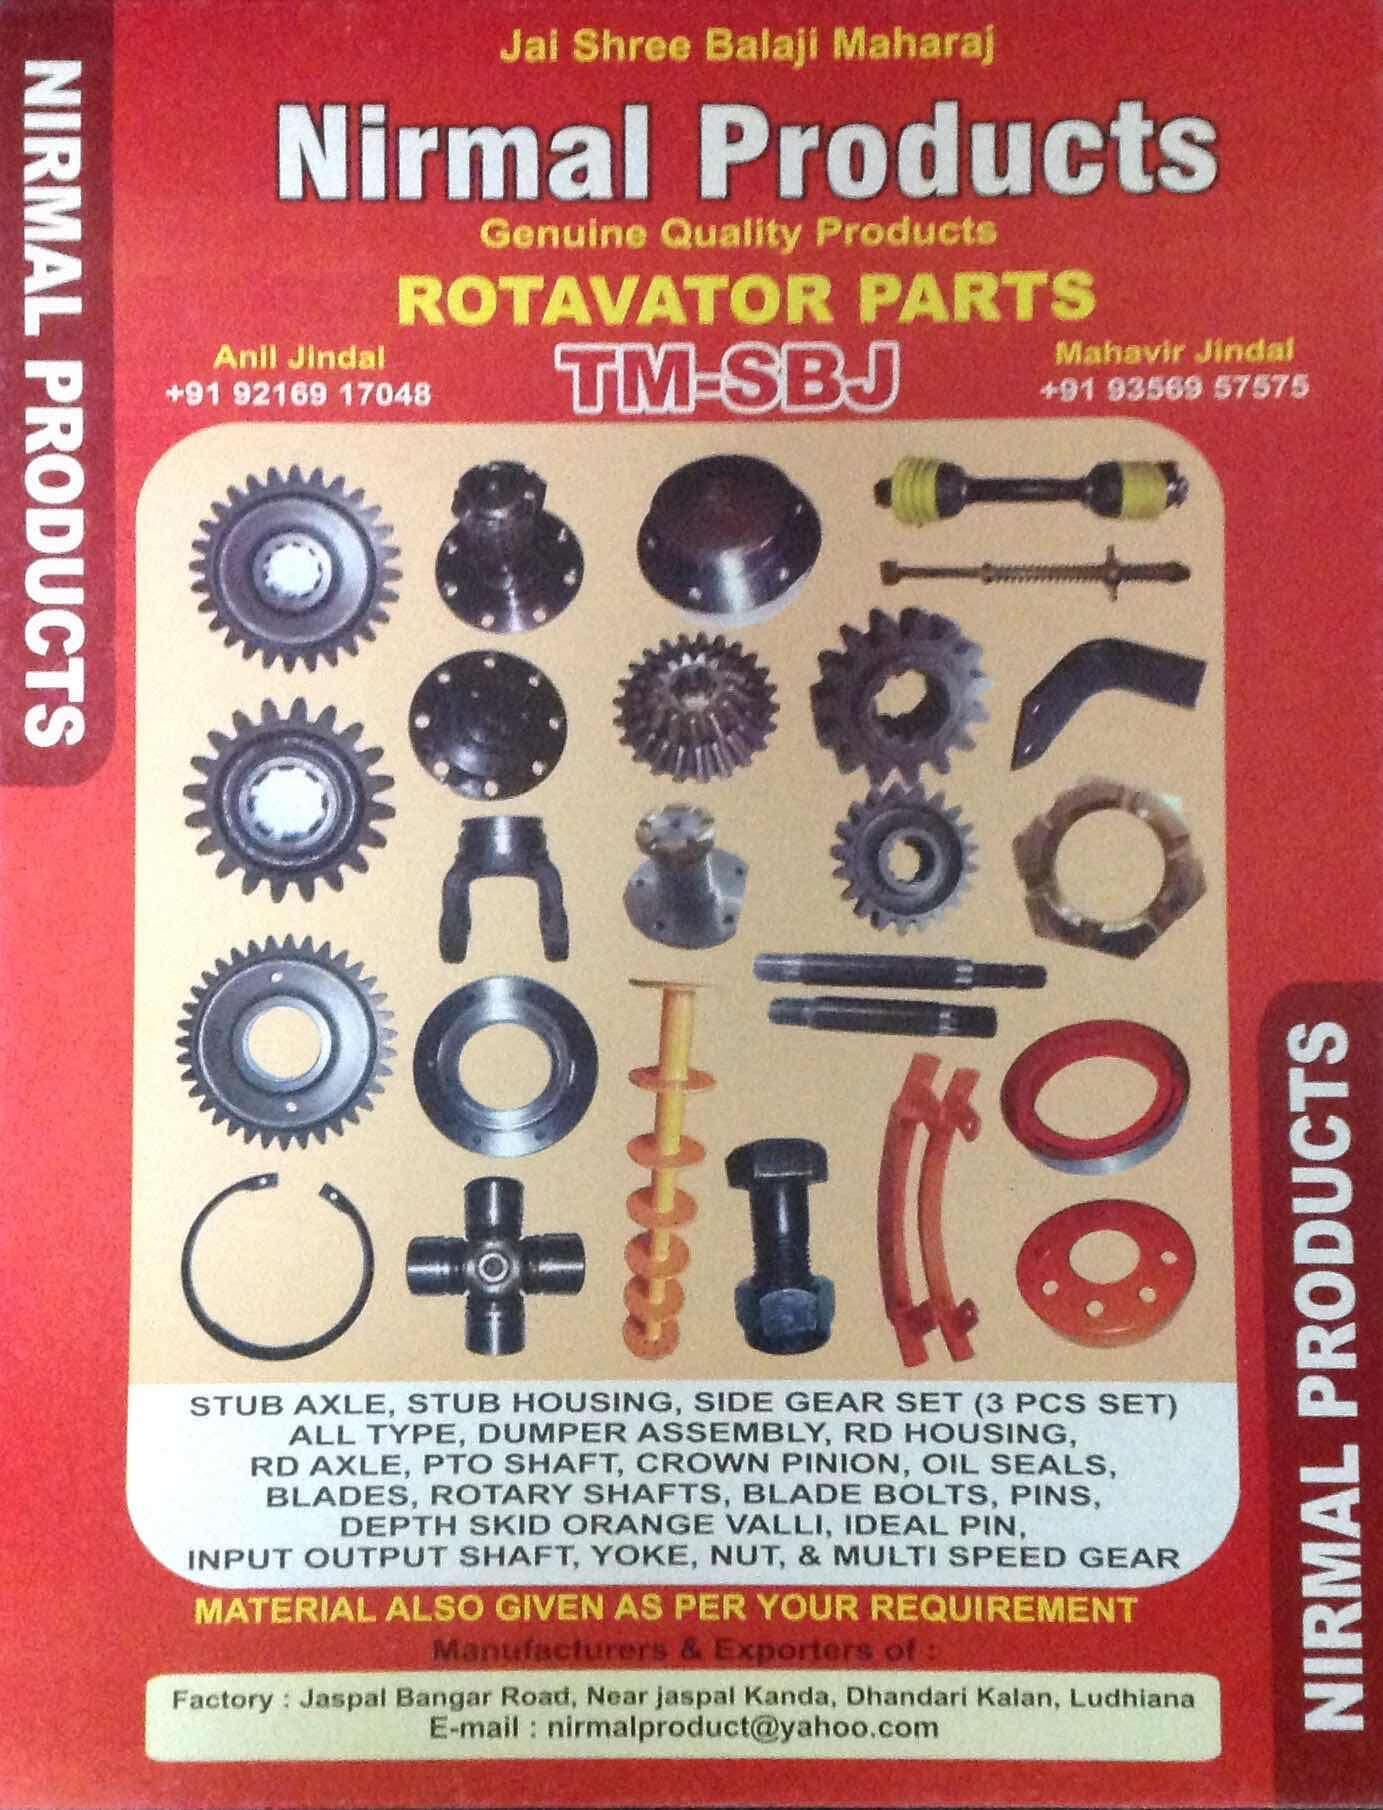 Top 30 Rotavator Spare Part Manufacturers in Sarabha Nagar Ludhiana